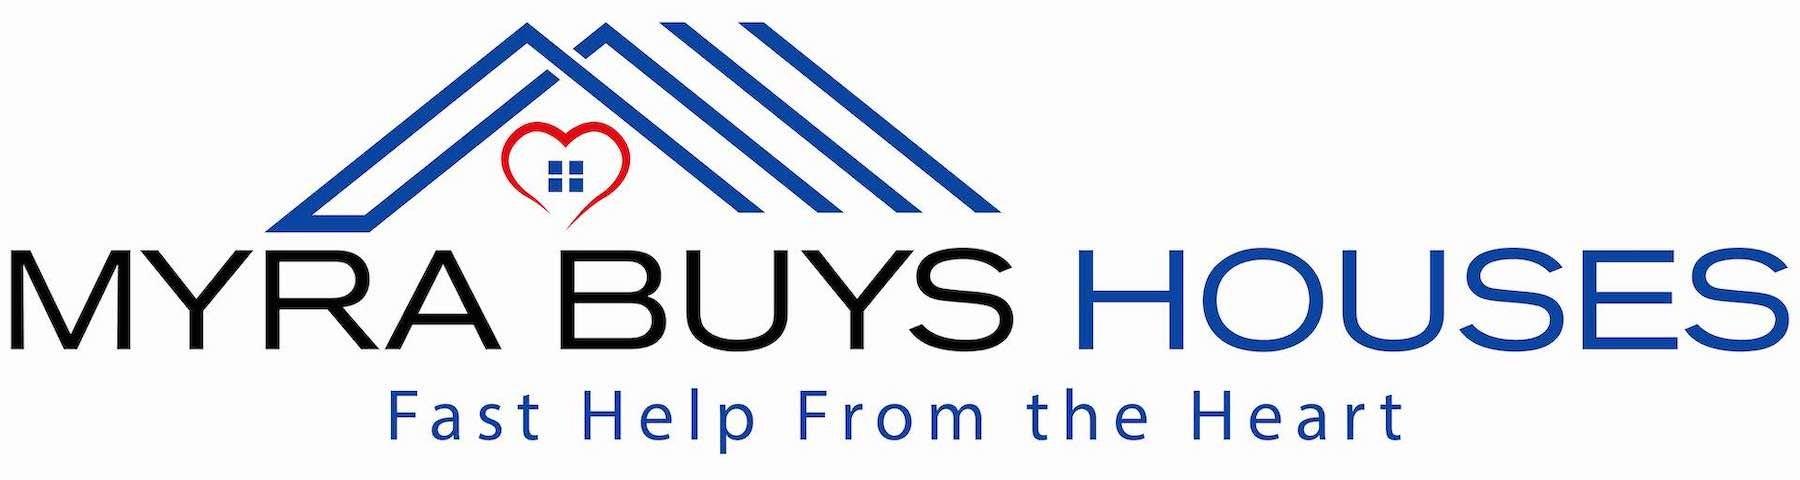 Myra Buys Houses  logo